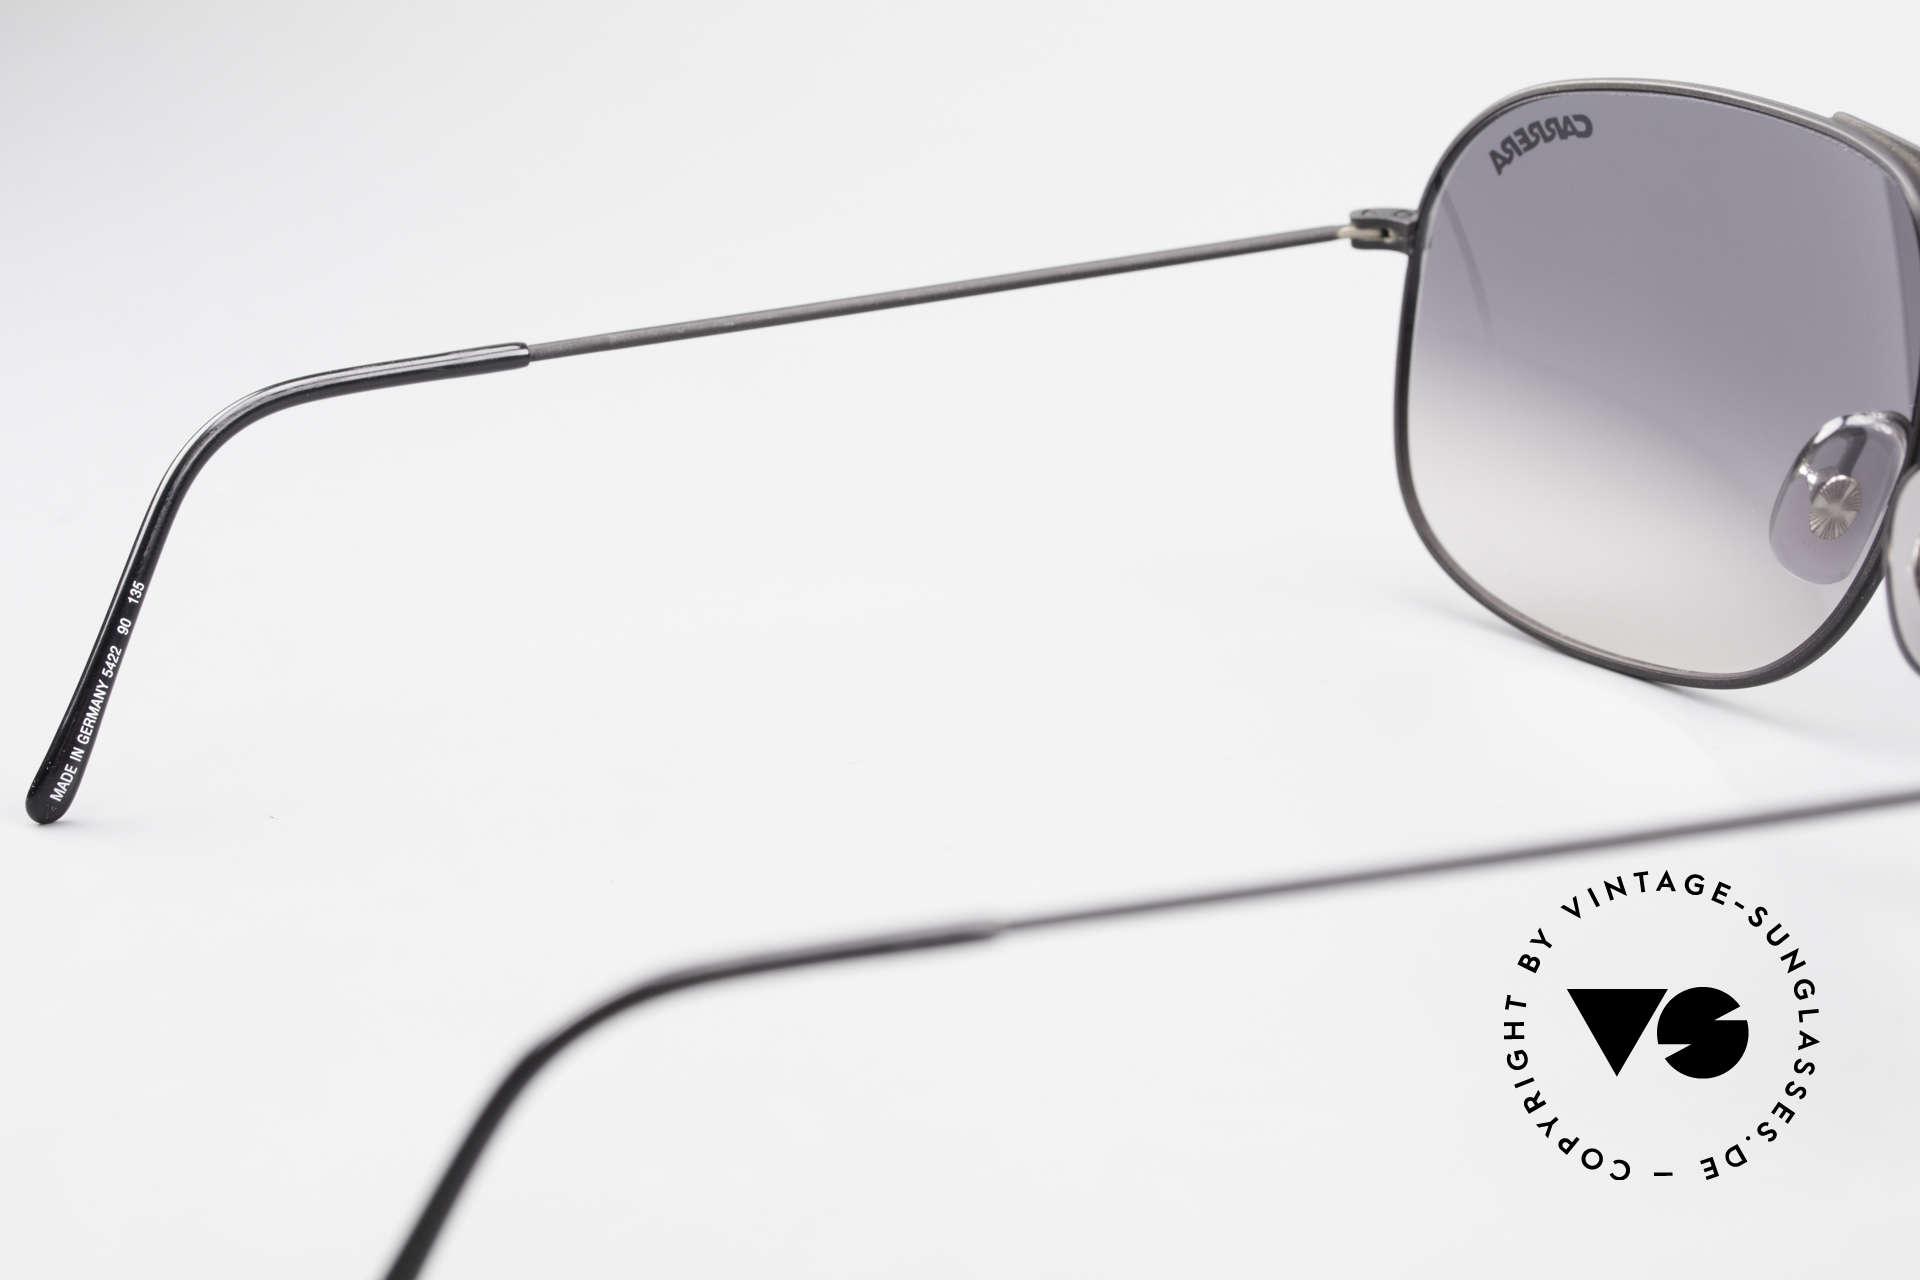 Carrera 5422 90's Shades 3 Sets of Lenses, NO RETRO SHADES, but a rare 30 years old ORIGINAL!, Made for Men